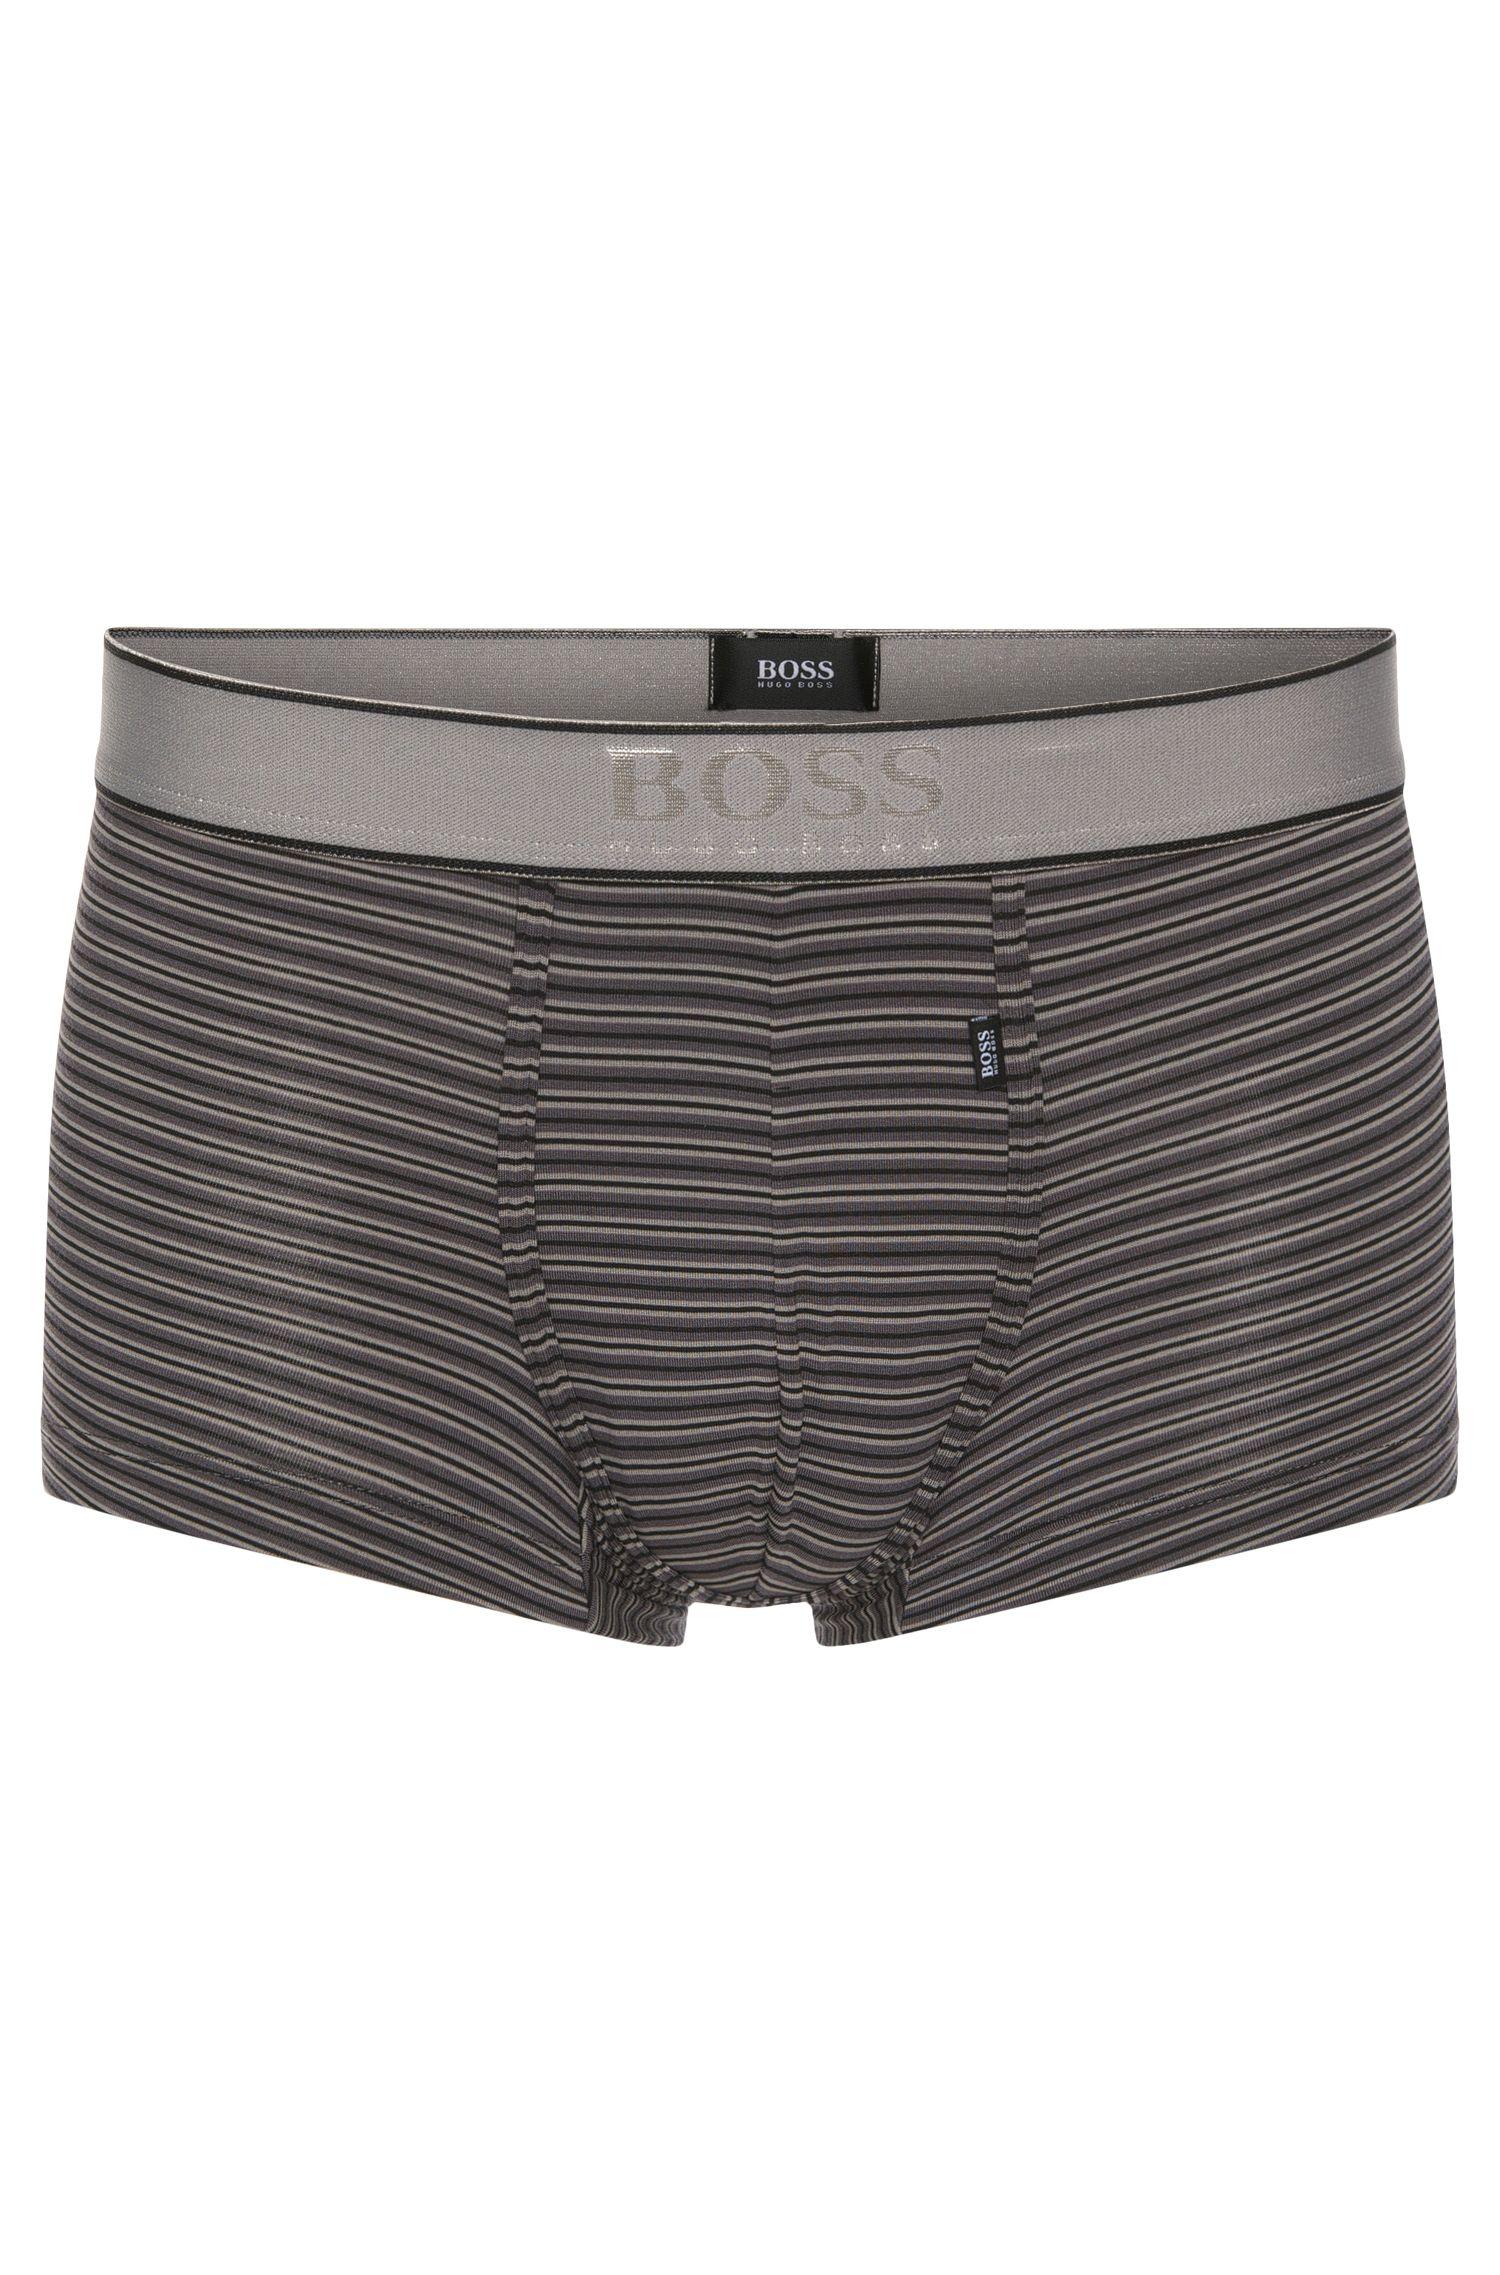 Striped boxer shorts in stretchy modal blend: 'Boxer Modal stripes'